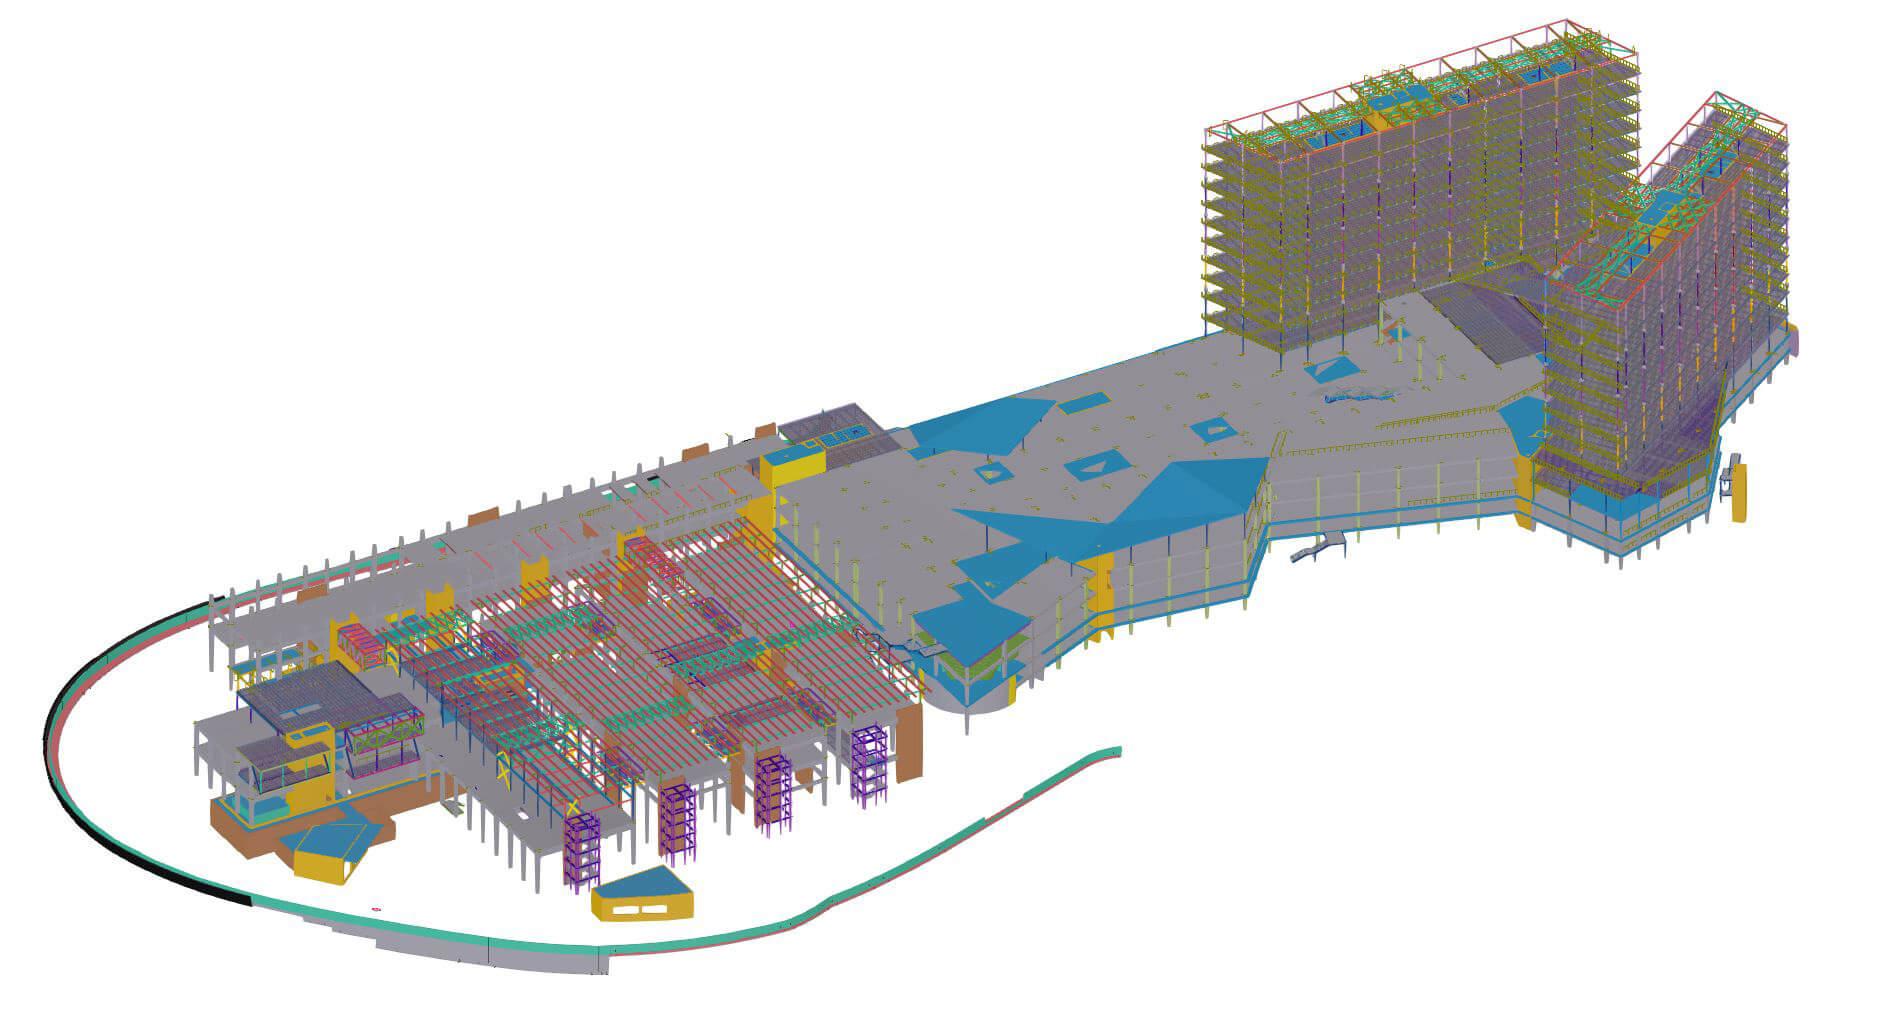 Nuova Scuola Politecnica di Genova